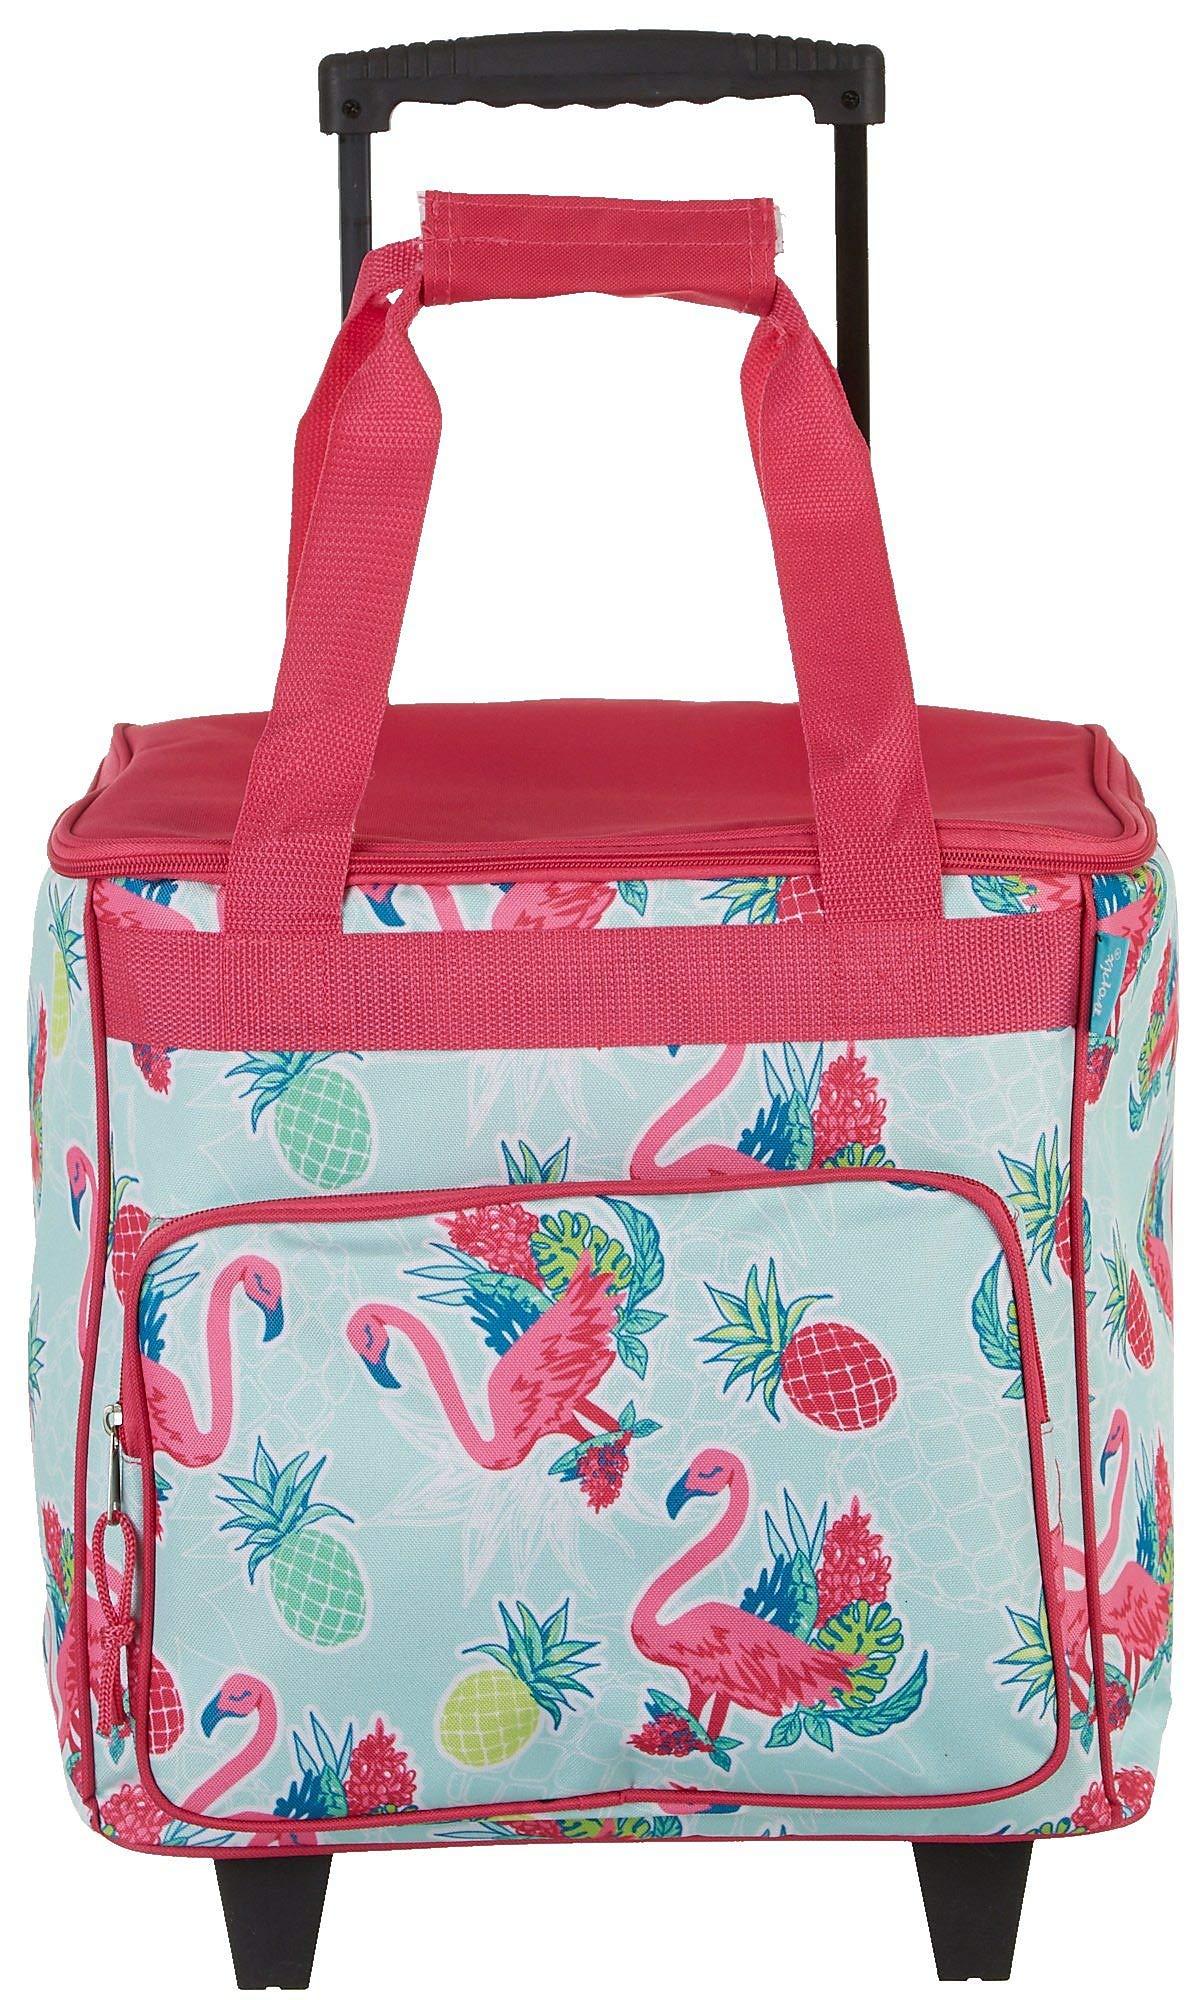 Tropix Flamingo Pineapple Rolling Cooler One Size Pink/Blue/Green